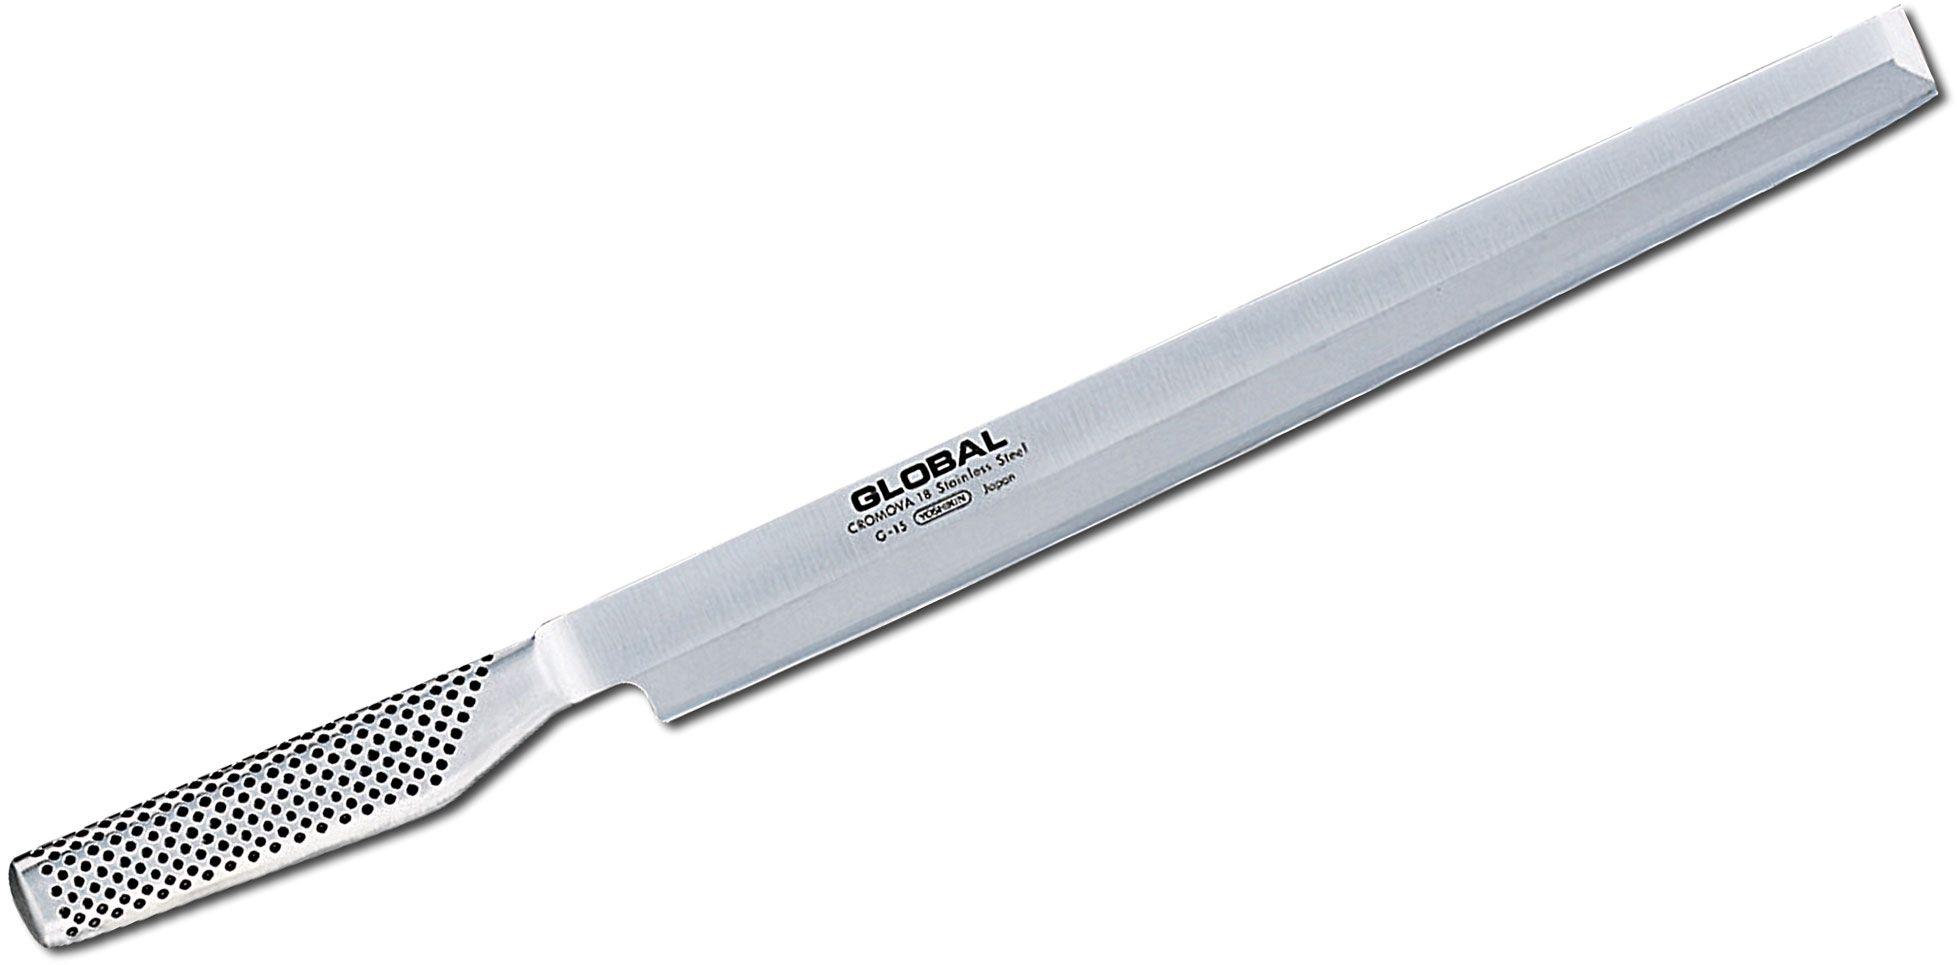 Global G-15R Classic 12 inch Tako Sashimi Knife